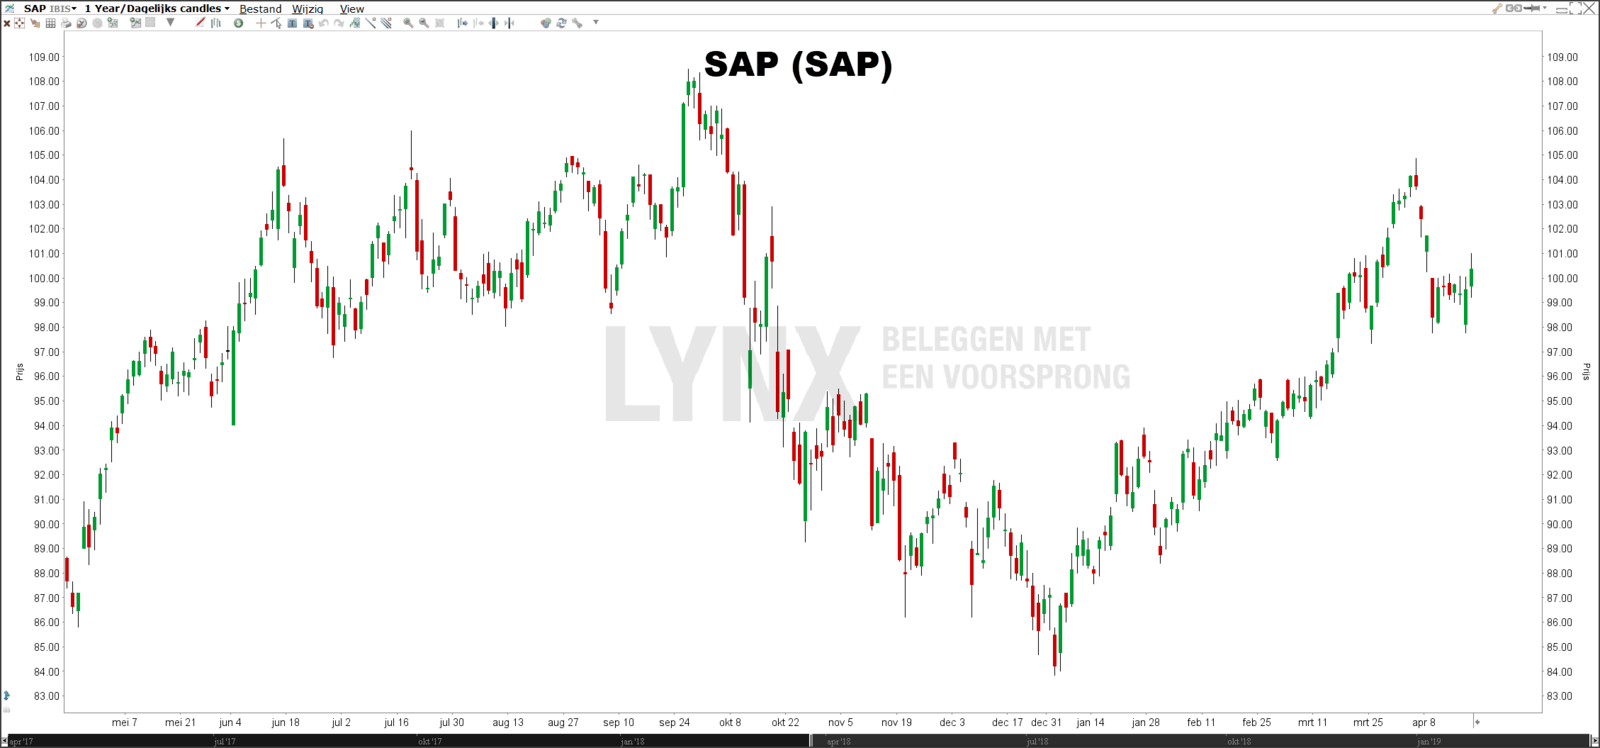 Beste dividendaandelen Duitsland - SAP koers